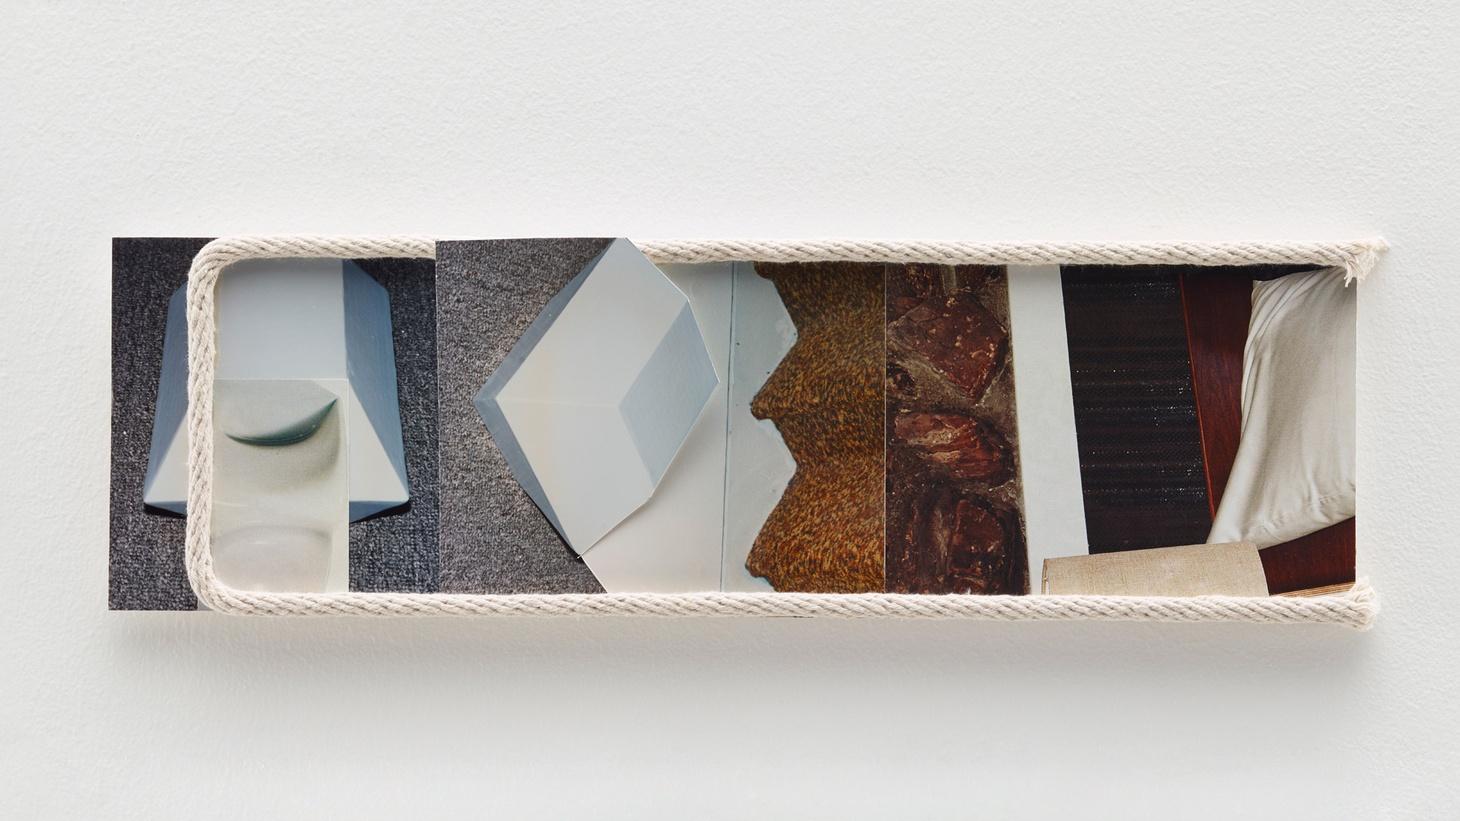 Hunter Drohojowska-Philp likes the soft power of the Bay Area artist.